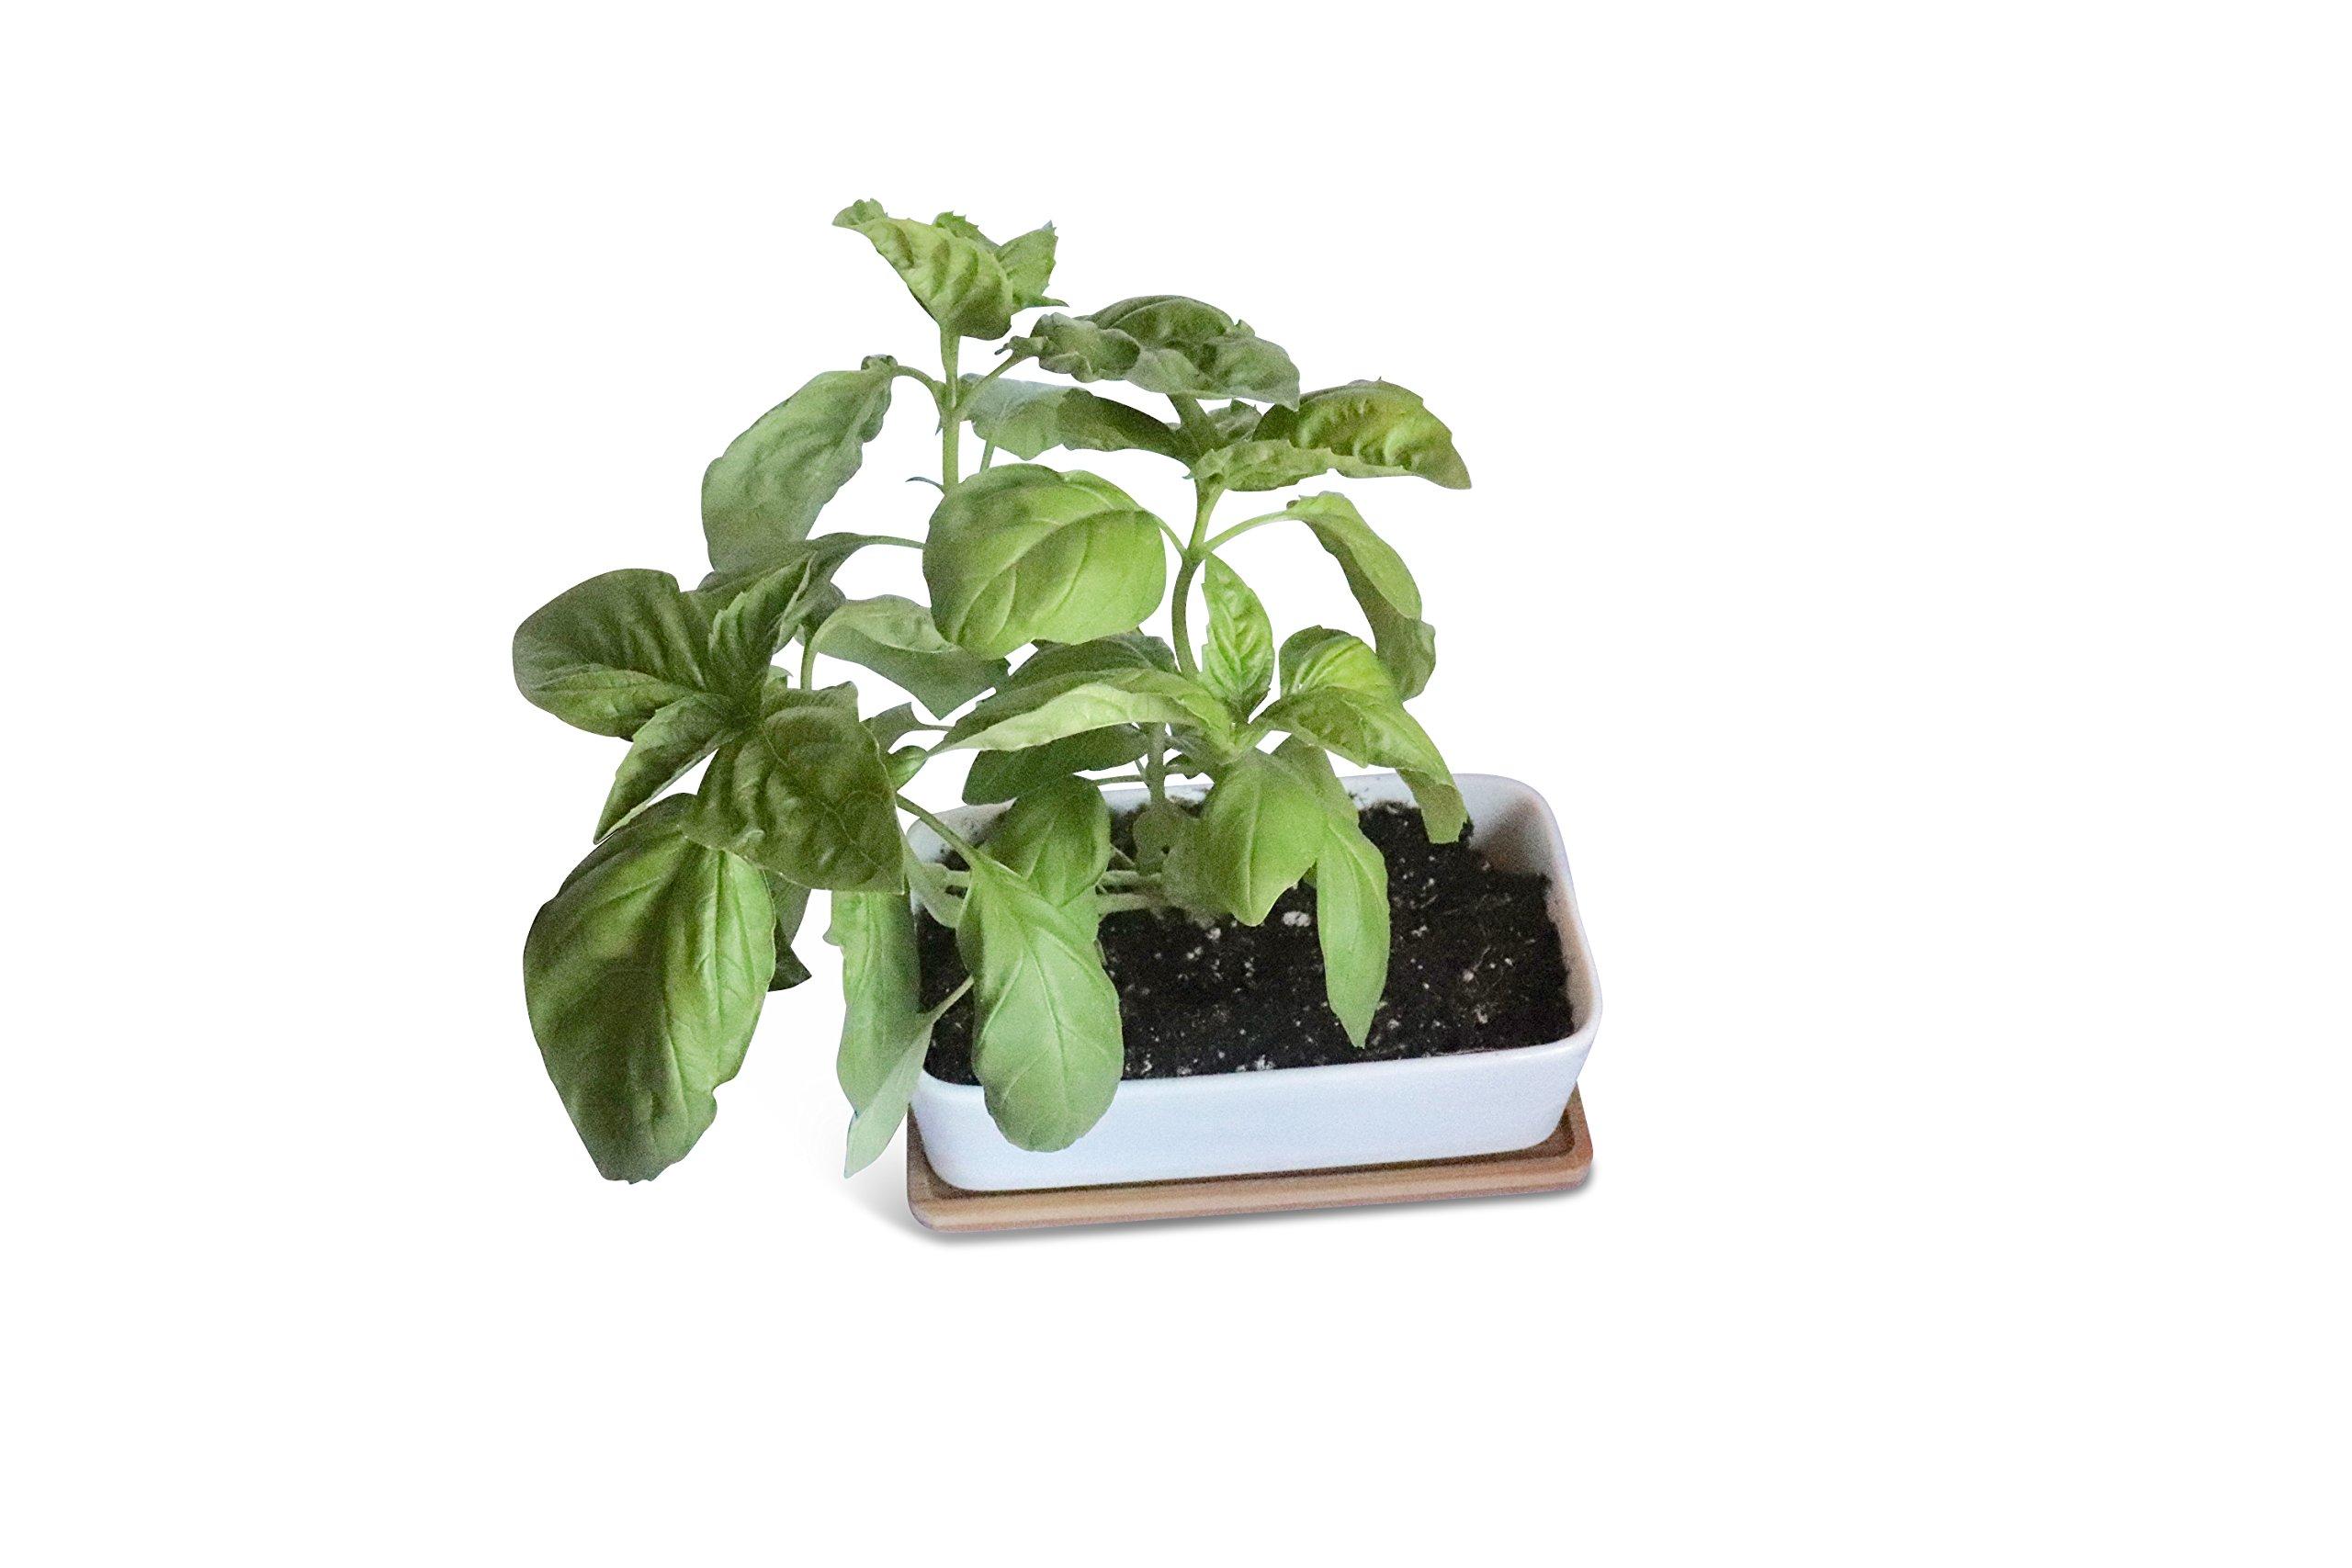 Set of 1+2 Kitchen Herb Garden Seed Starter Self Grow Kits for Windowsill. Indoor Vegetable Planter Pots Kit w/Heirloom Non GMO Organic Herbs Basil, Parsley, Oregano. Wider Mason Jars Gardening Gift